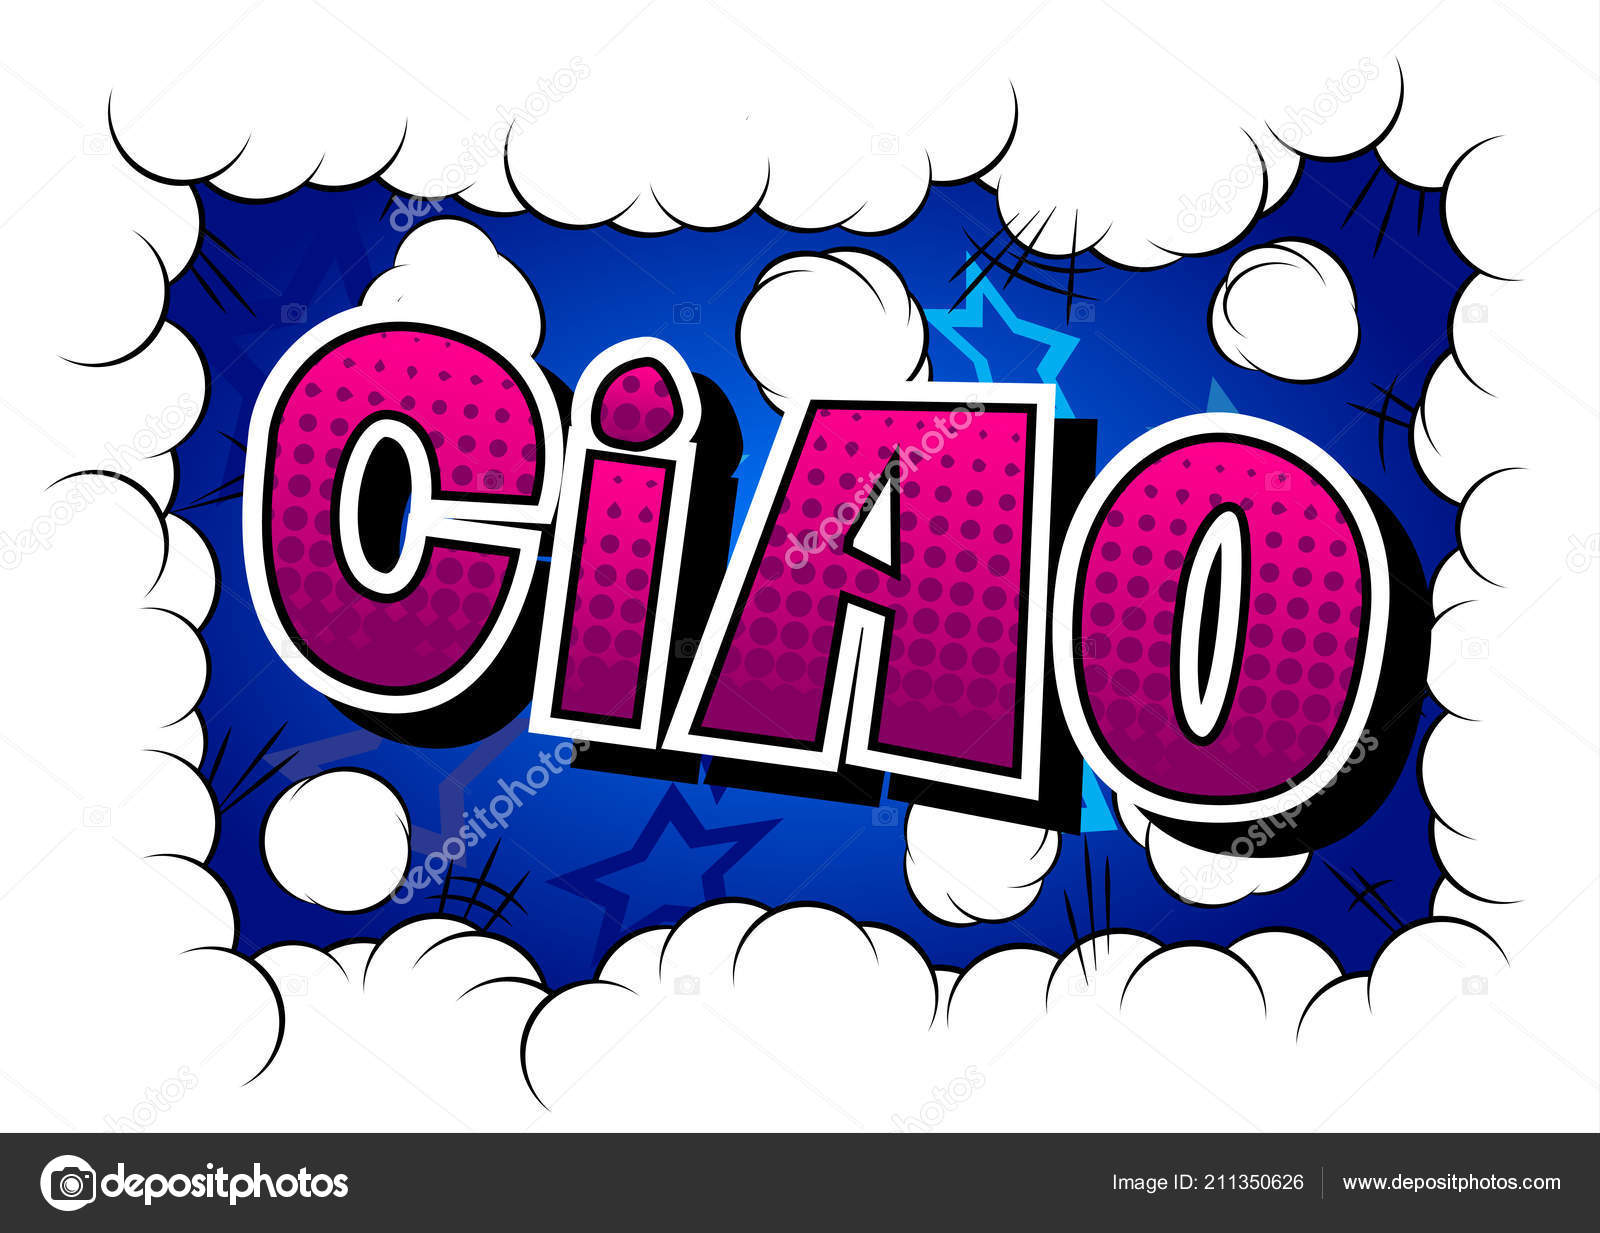 Cogli l'attimo ... - Pagina 5 Depositphotos_211350626-stock-illustration-ciao-hello-bye-italian-vector